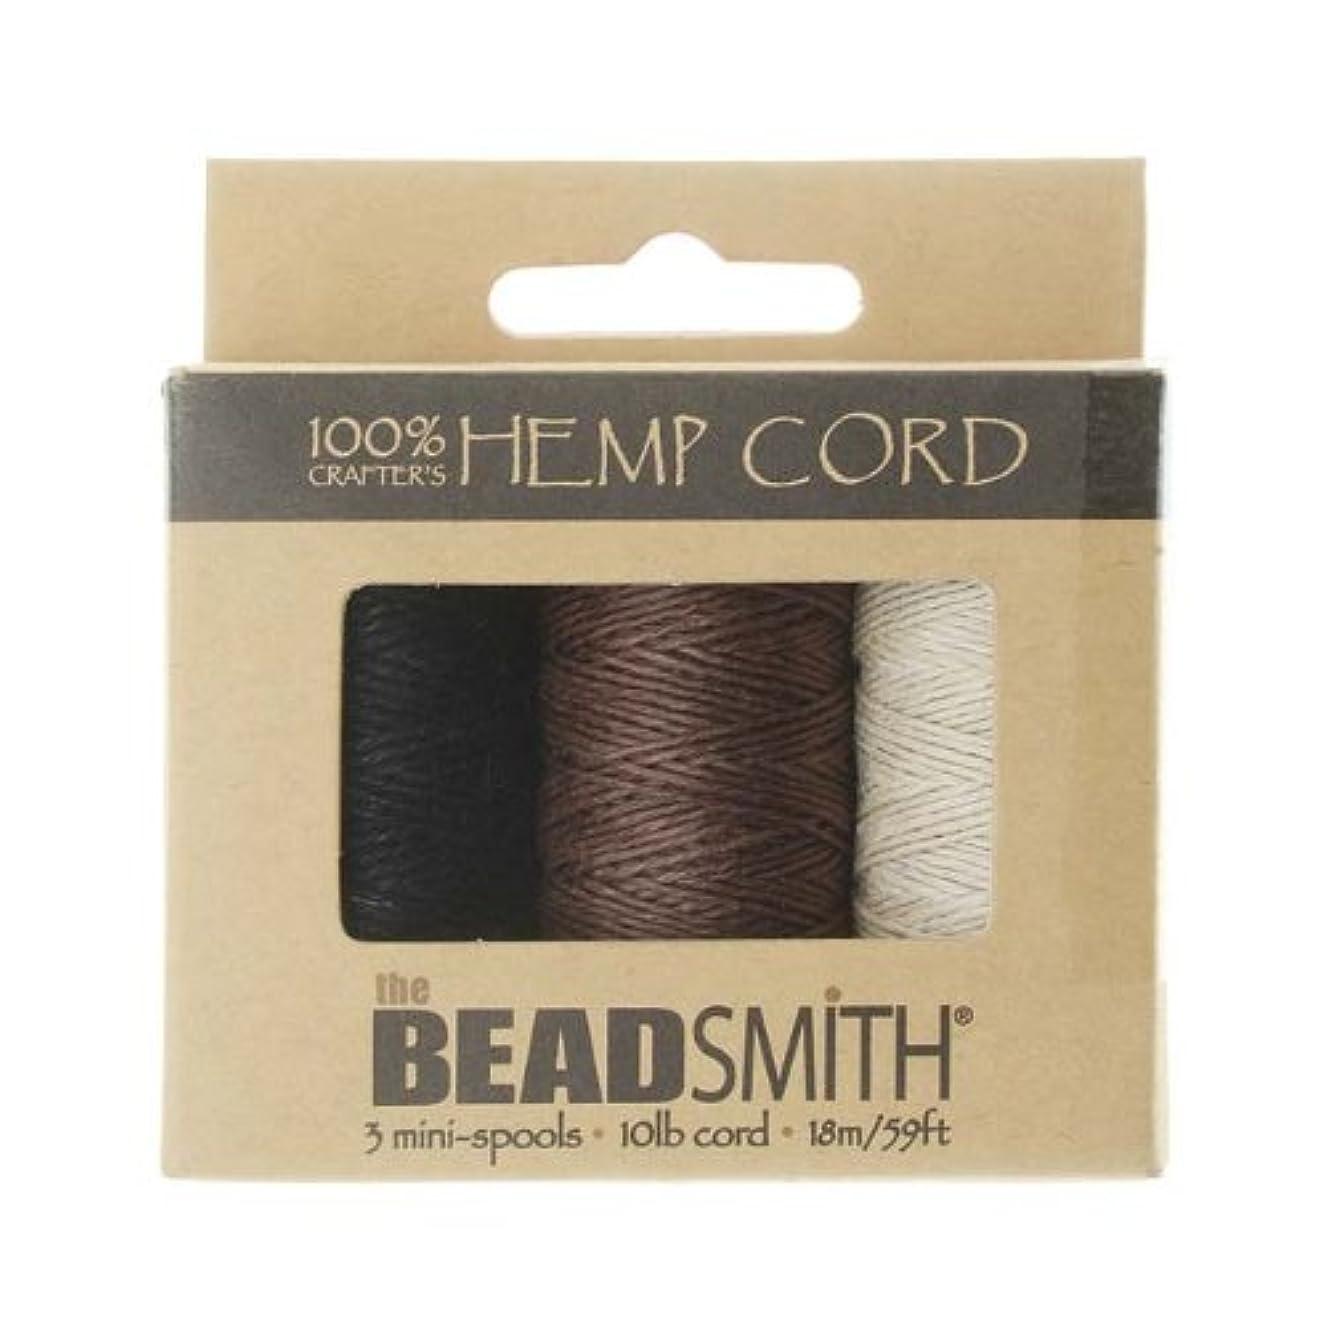 Hemp Twine Bead Cord .5mm 3 Spool App 59 Feet 42543 by Beadsmith